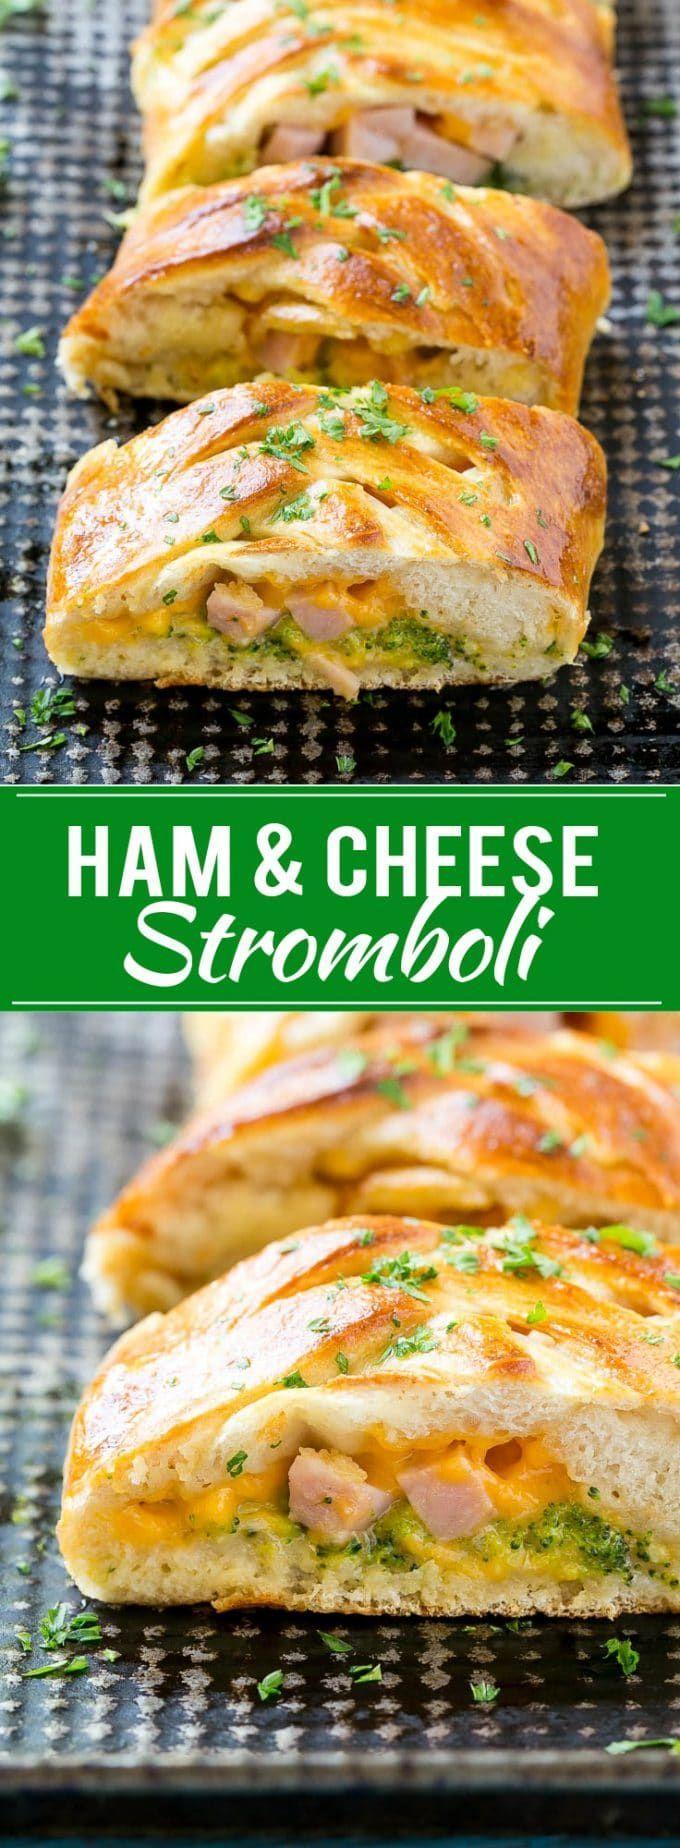 Ham and Cheese Stromboli Recipe | Easy Stromboli Recipe | Leftover Ham Recipe